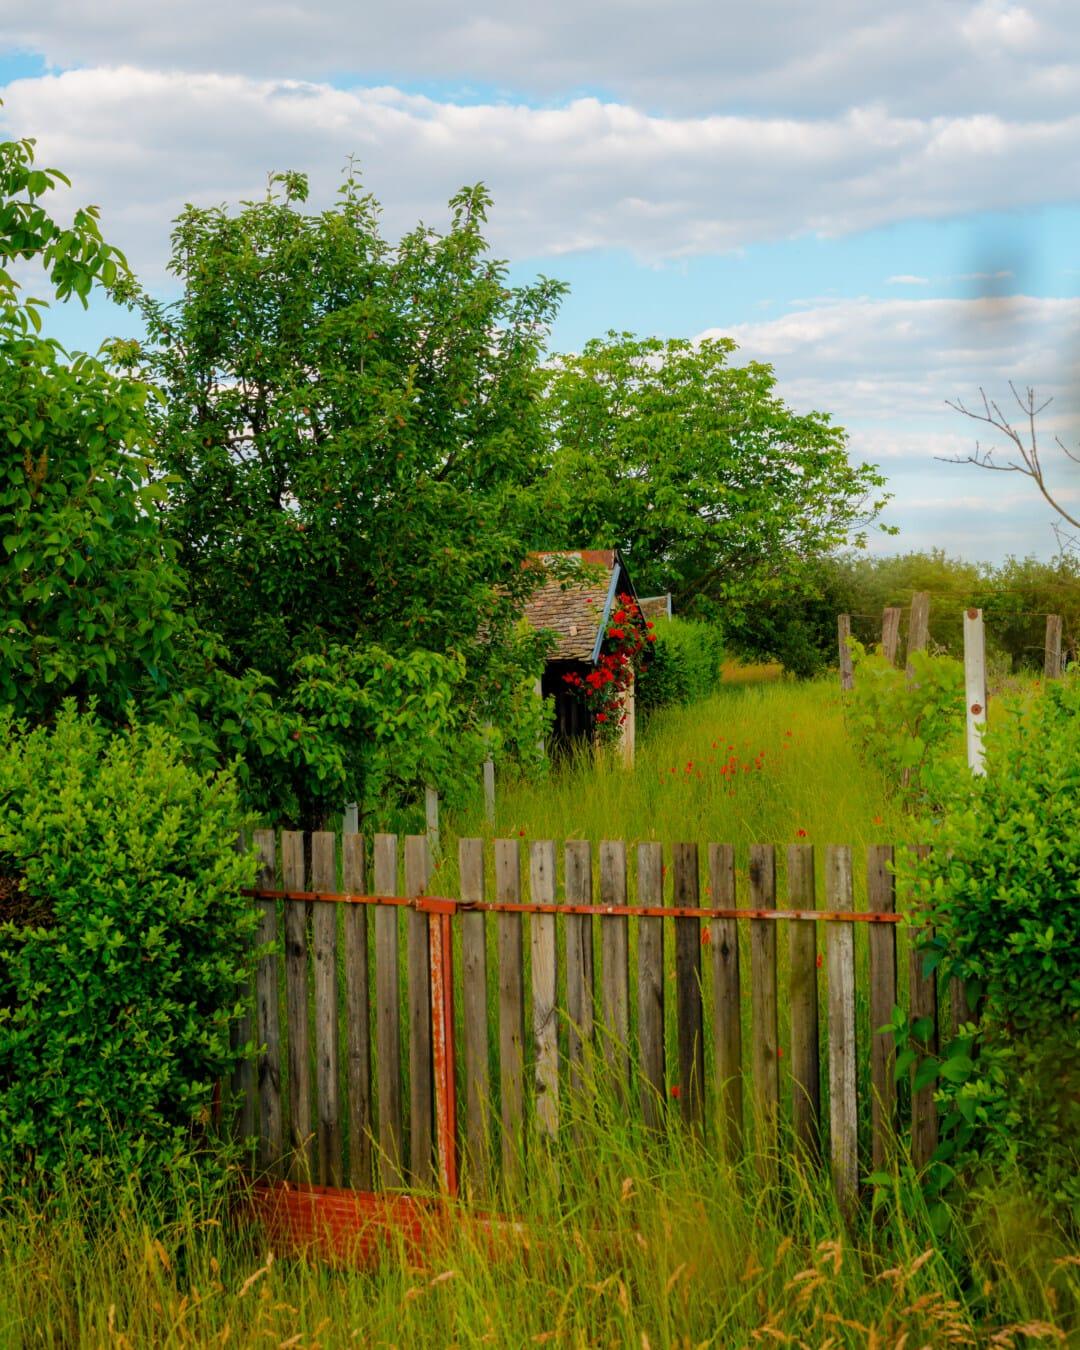 picket fence, barn, farm, village, farmland, farmhouse, orchard, trees, landscape, grass